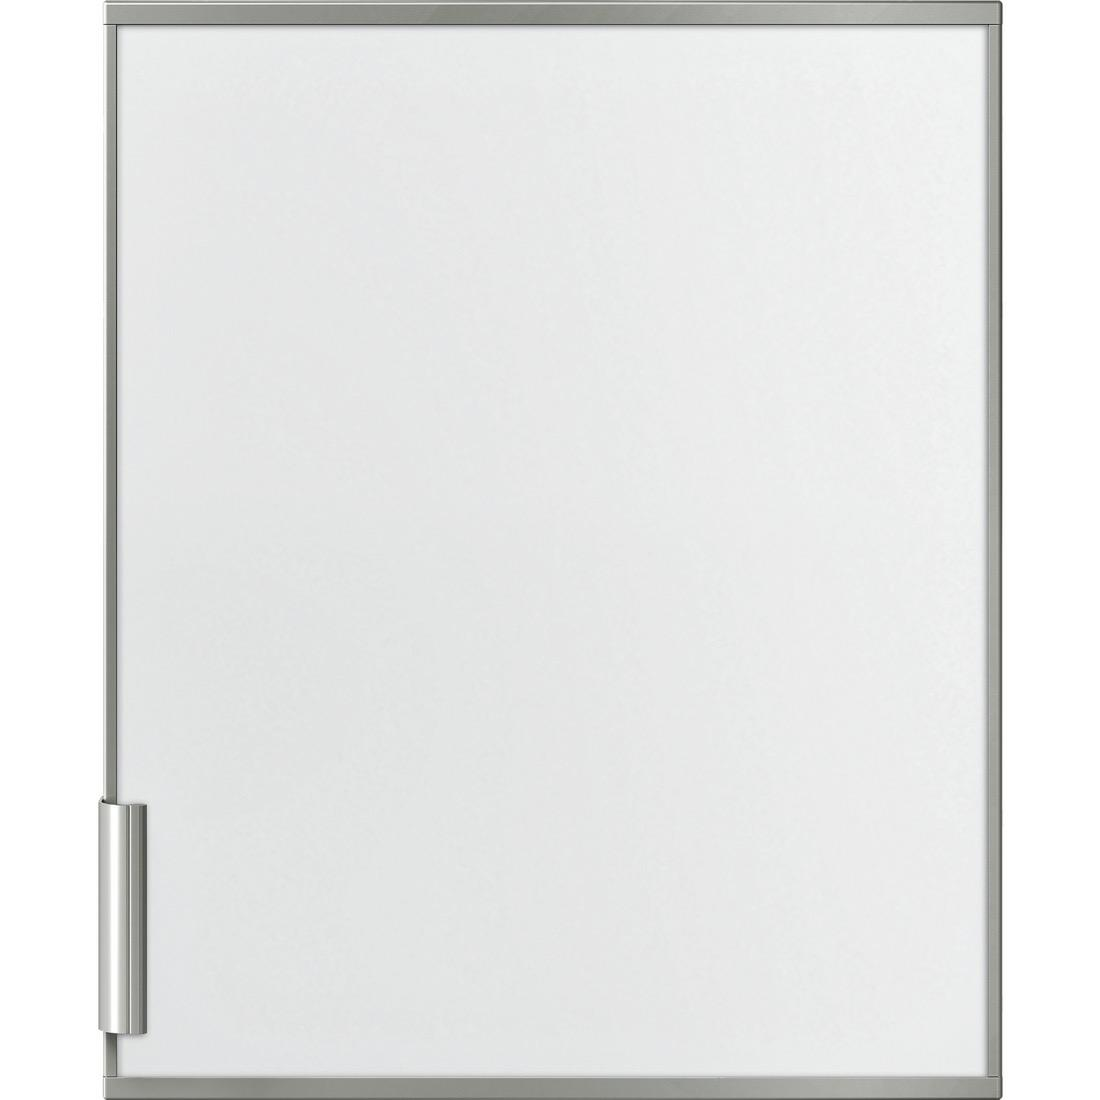 toebehoren koelkast Bosch Toebehoren KFZ10AX0 toebehoren koelkast KFZ 10AX0 KFZ 10 AX 0